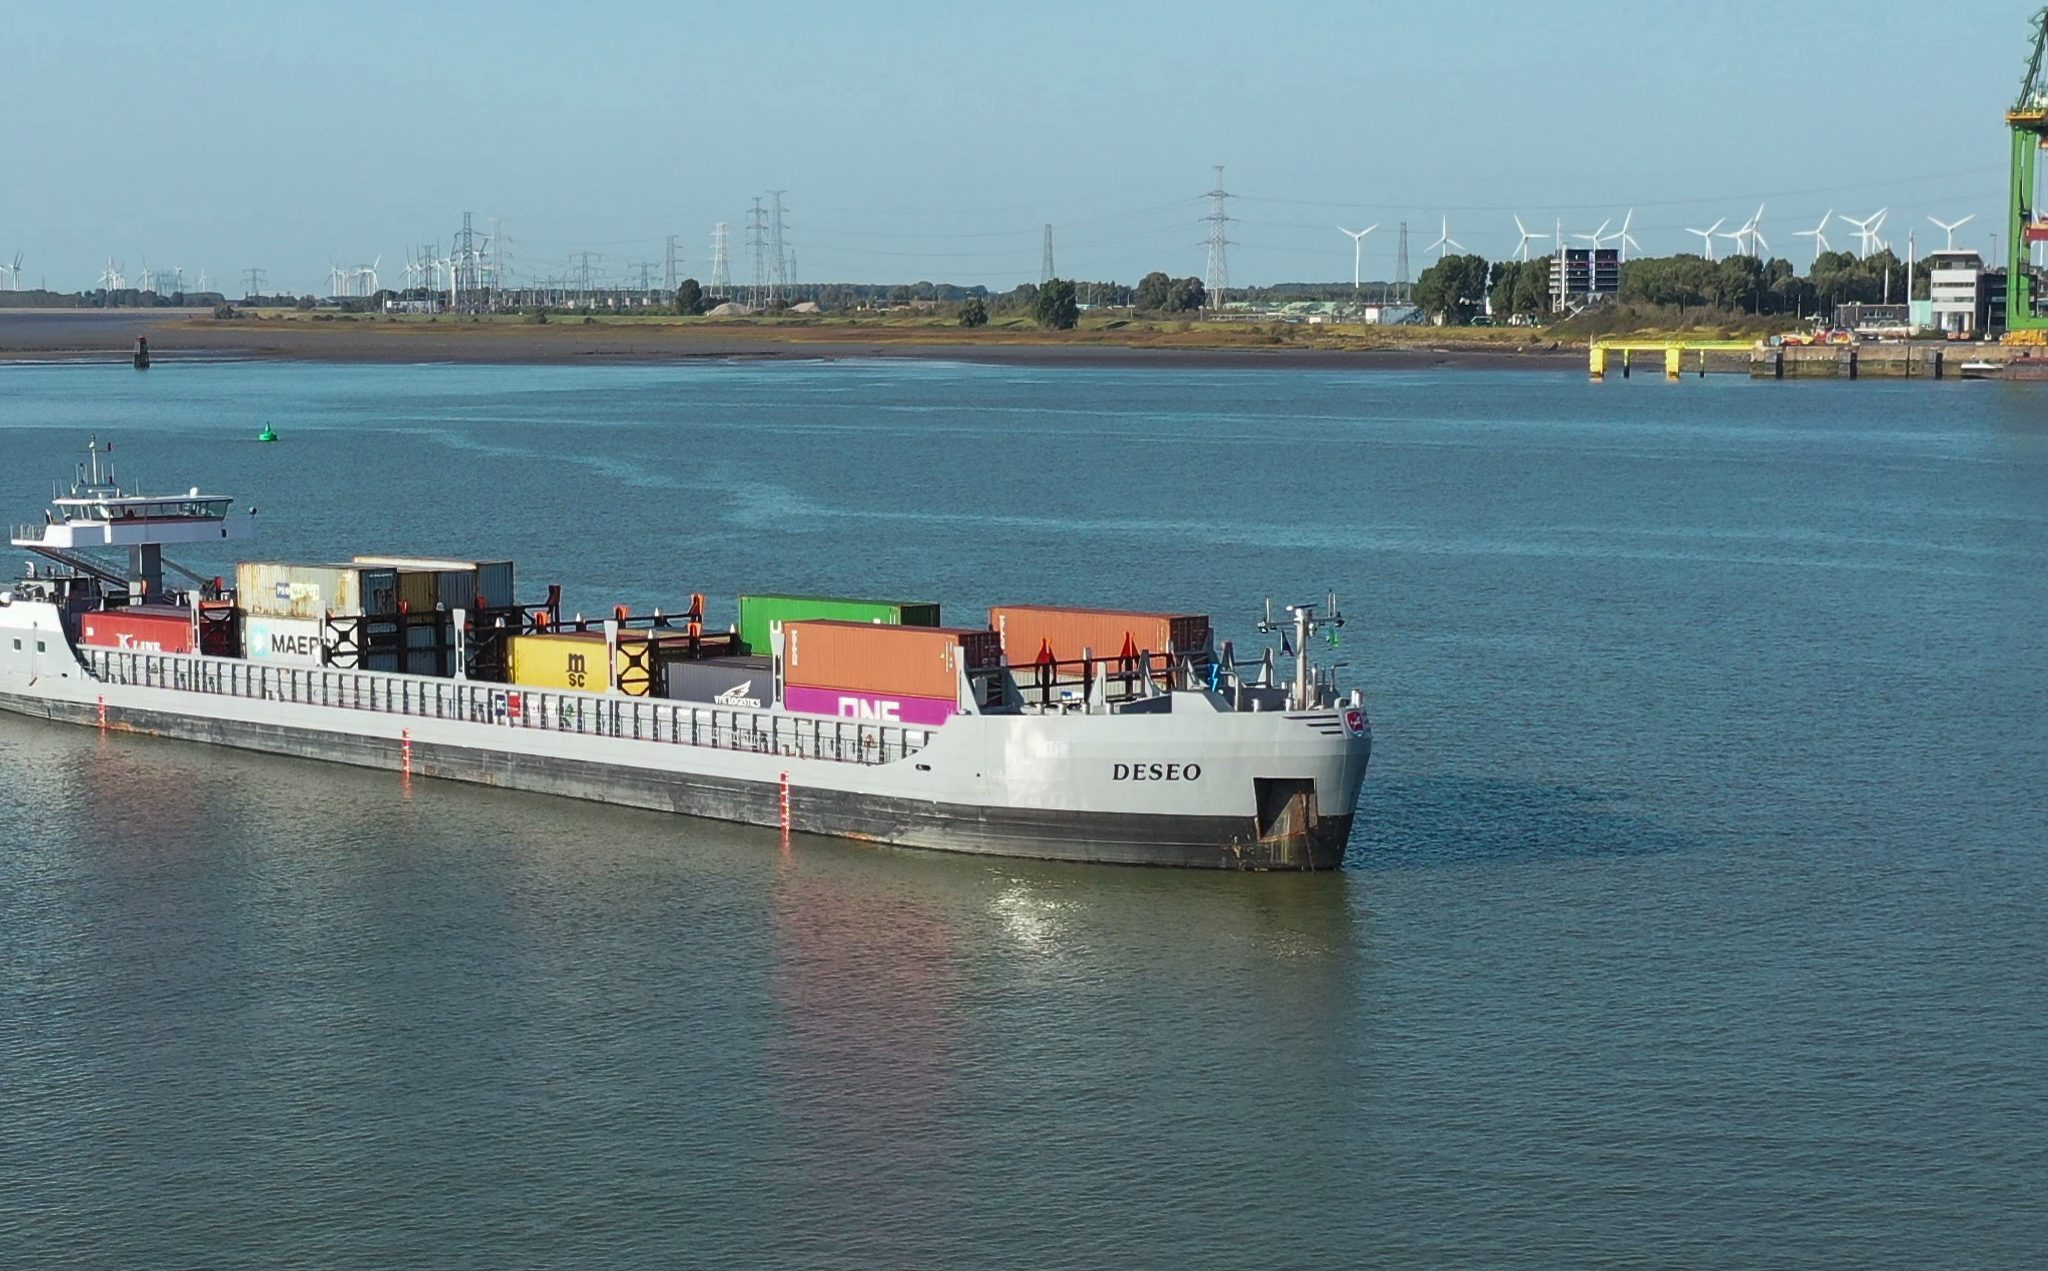 Het semi-autonome containerschip Deseo. (Foto Seafar)